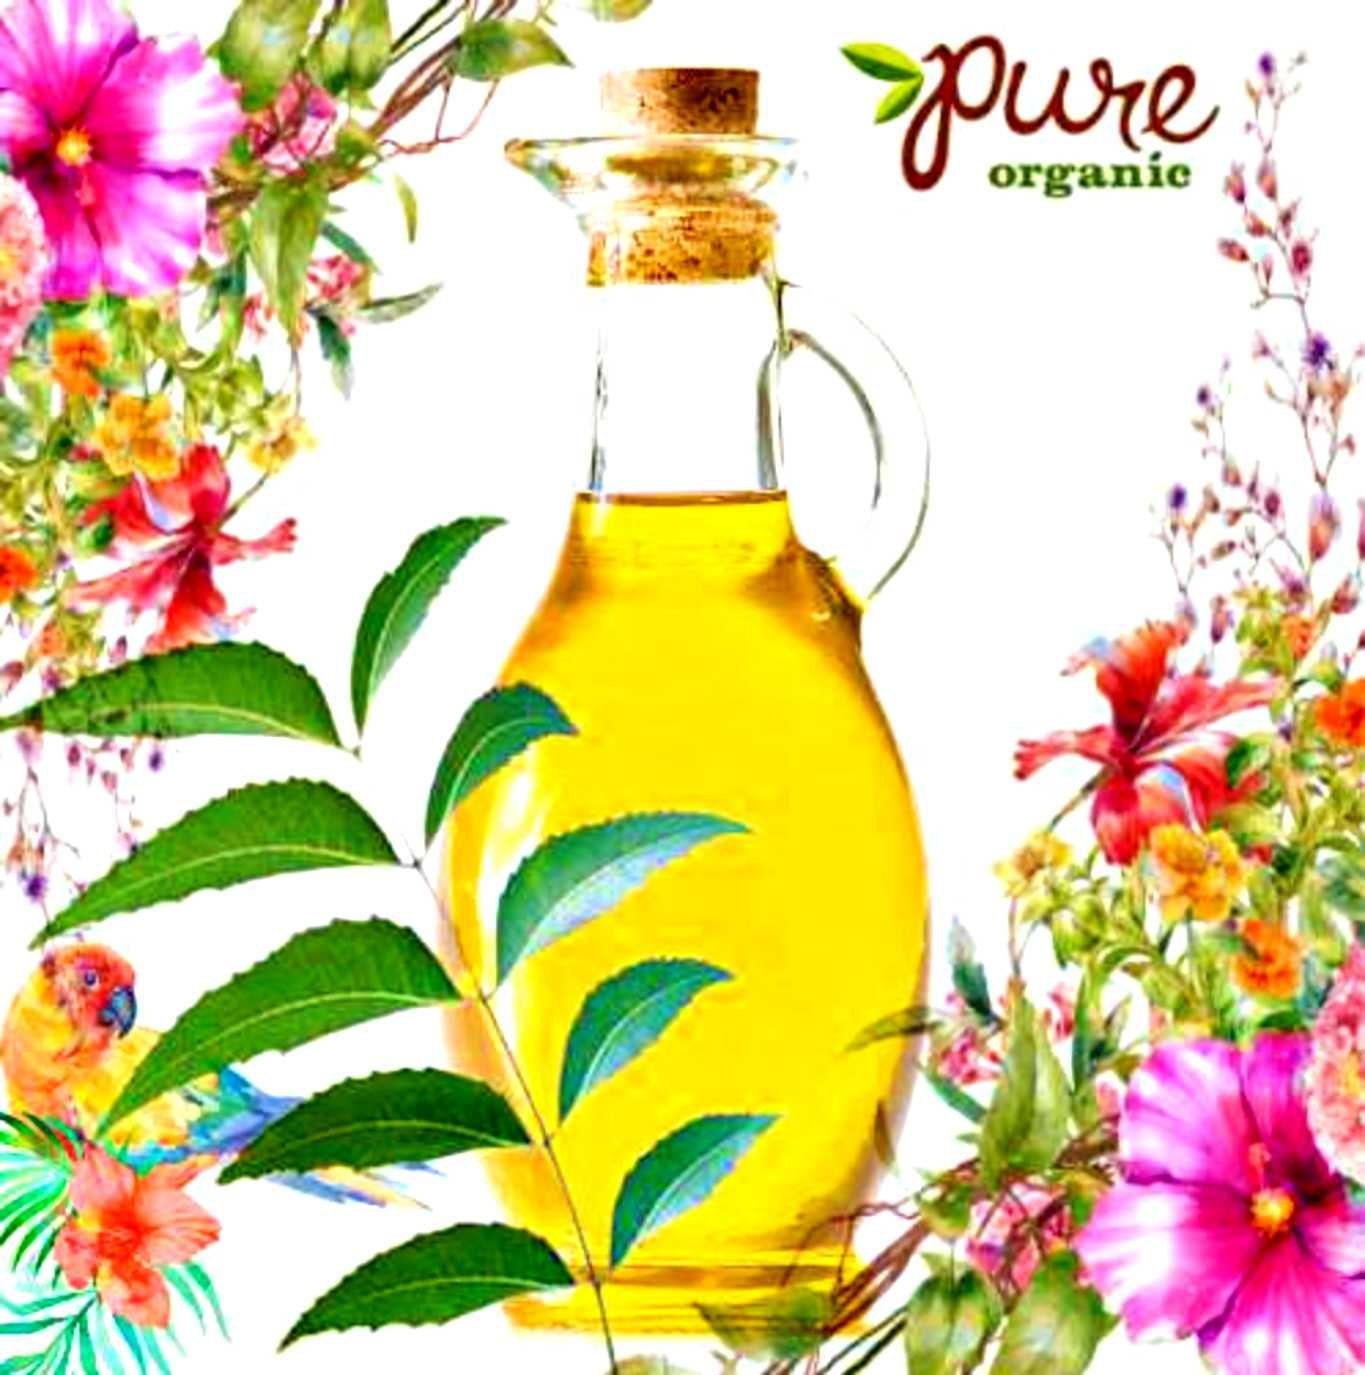 Organic Neem Oil/Cleanse Hair/ Kills Lice/ Acne Oil/ Acne